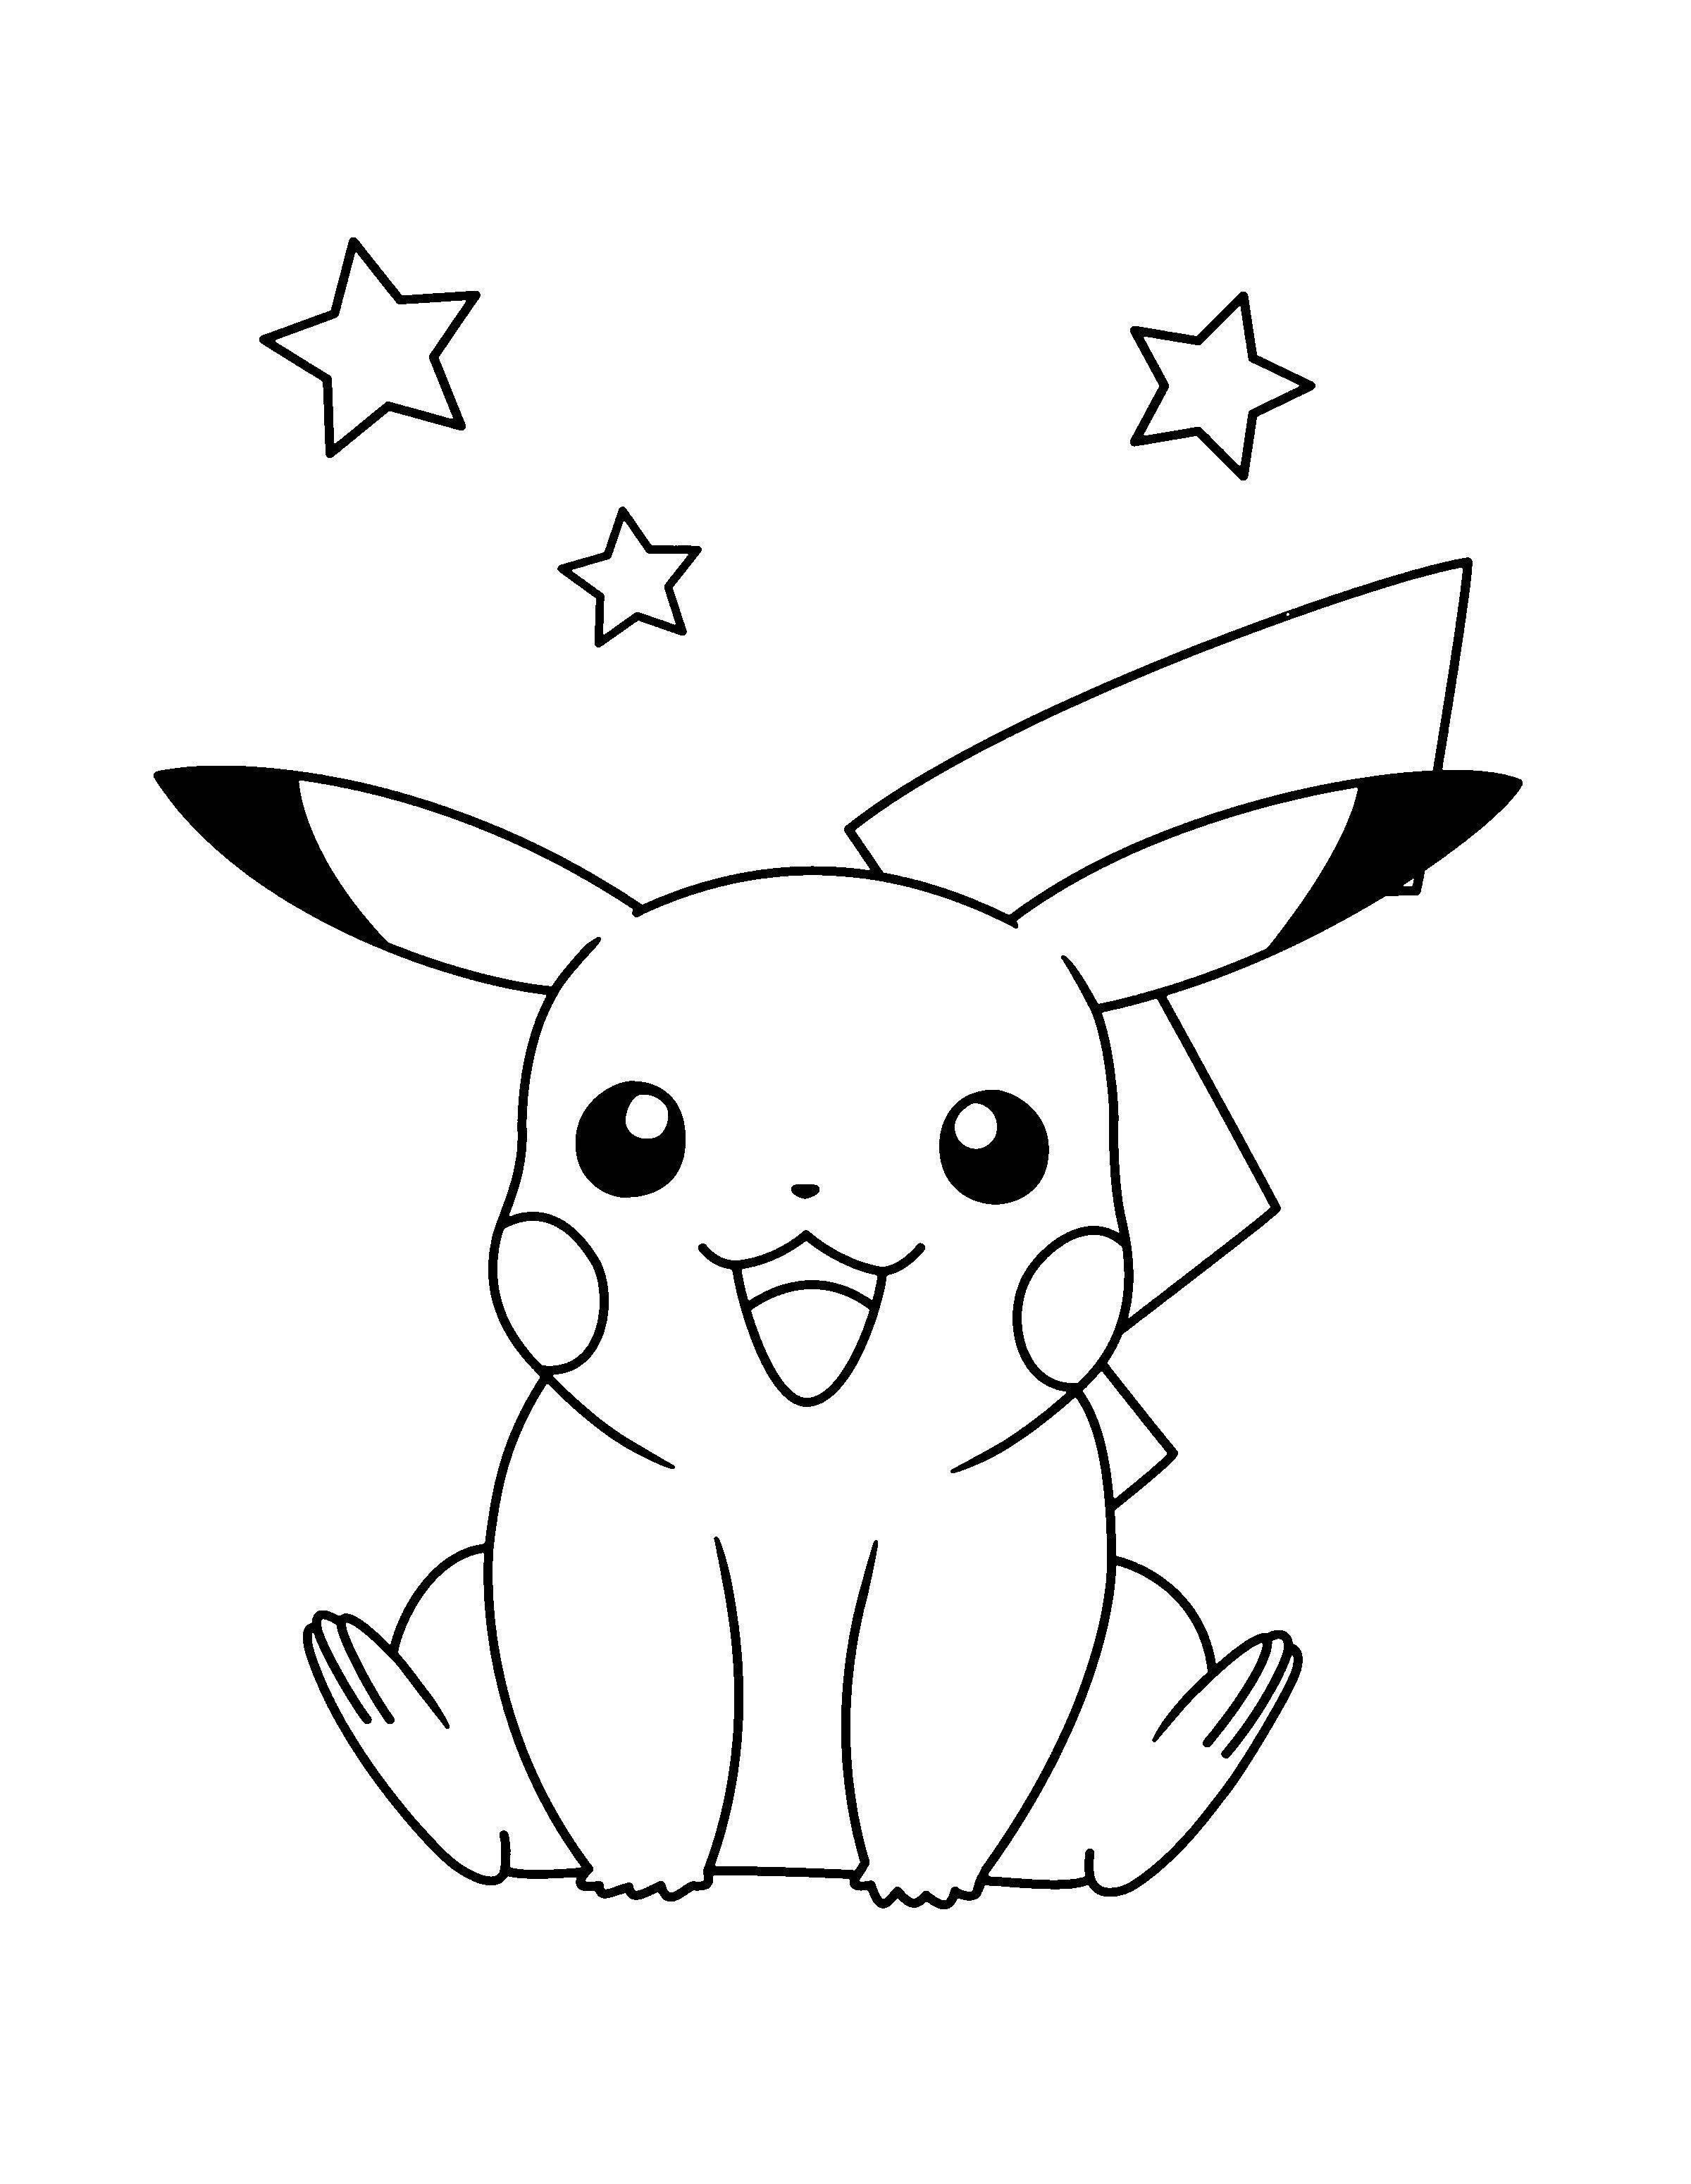 Ausmalbilder Pokemon Go Genial Pichu Coloring Pages Luxury Ausmalbilder Pokemon Pikachu Neu Stock